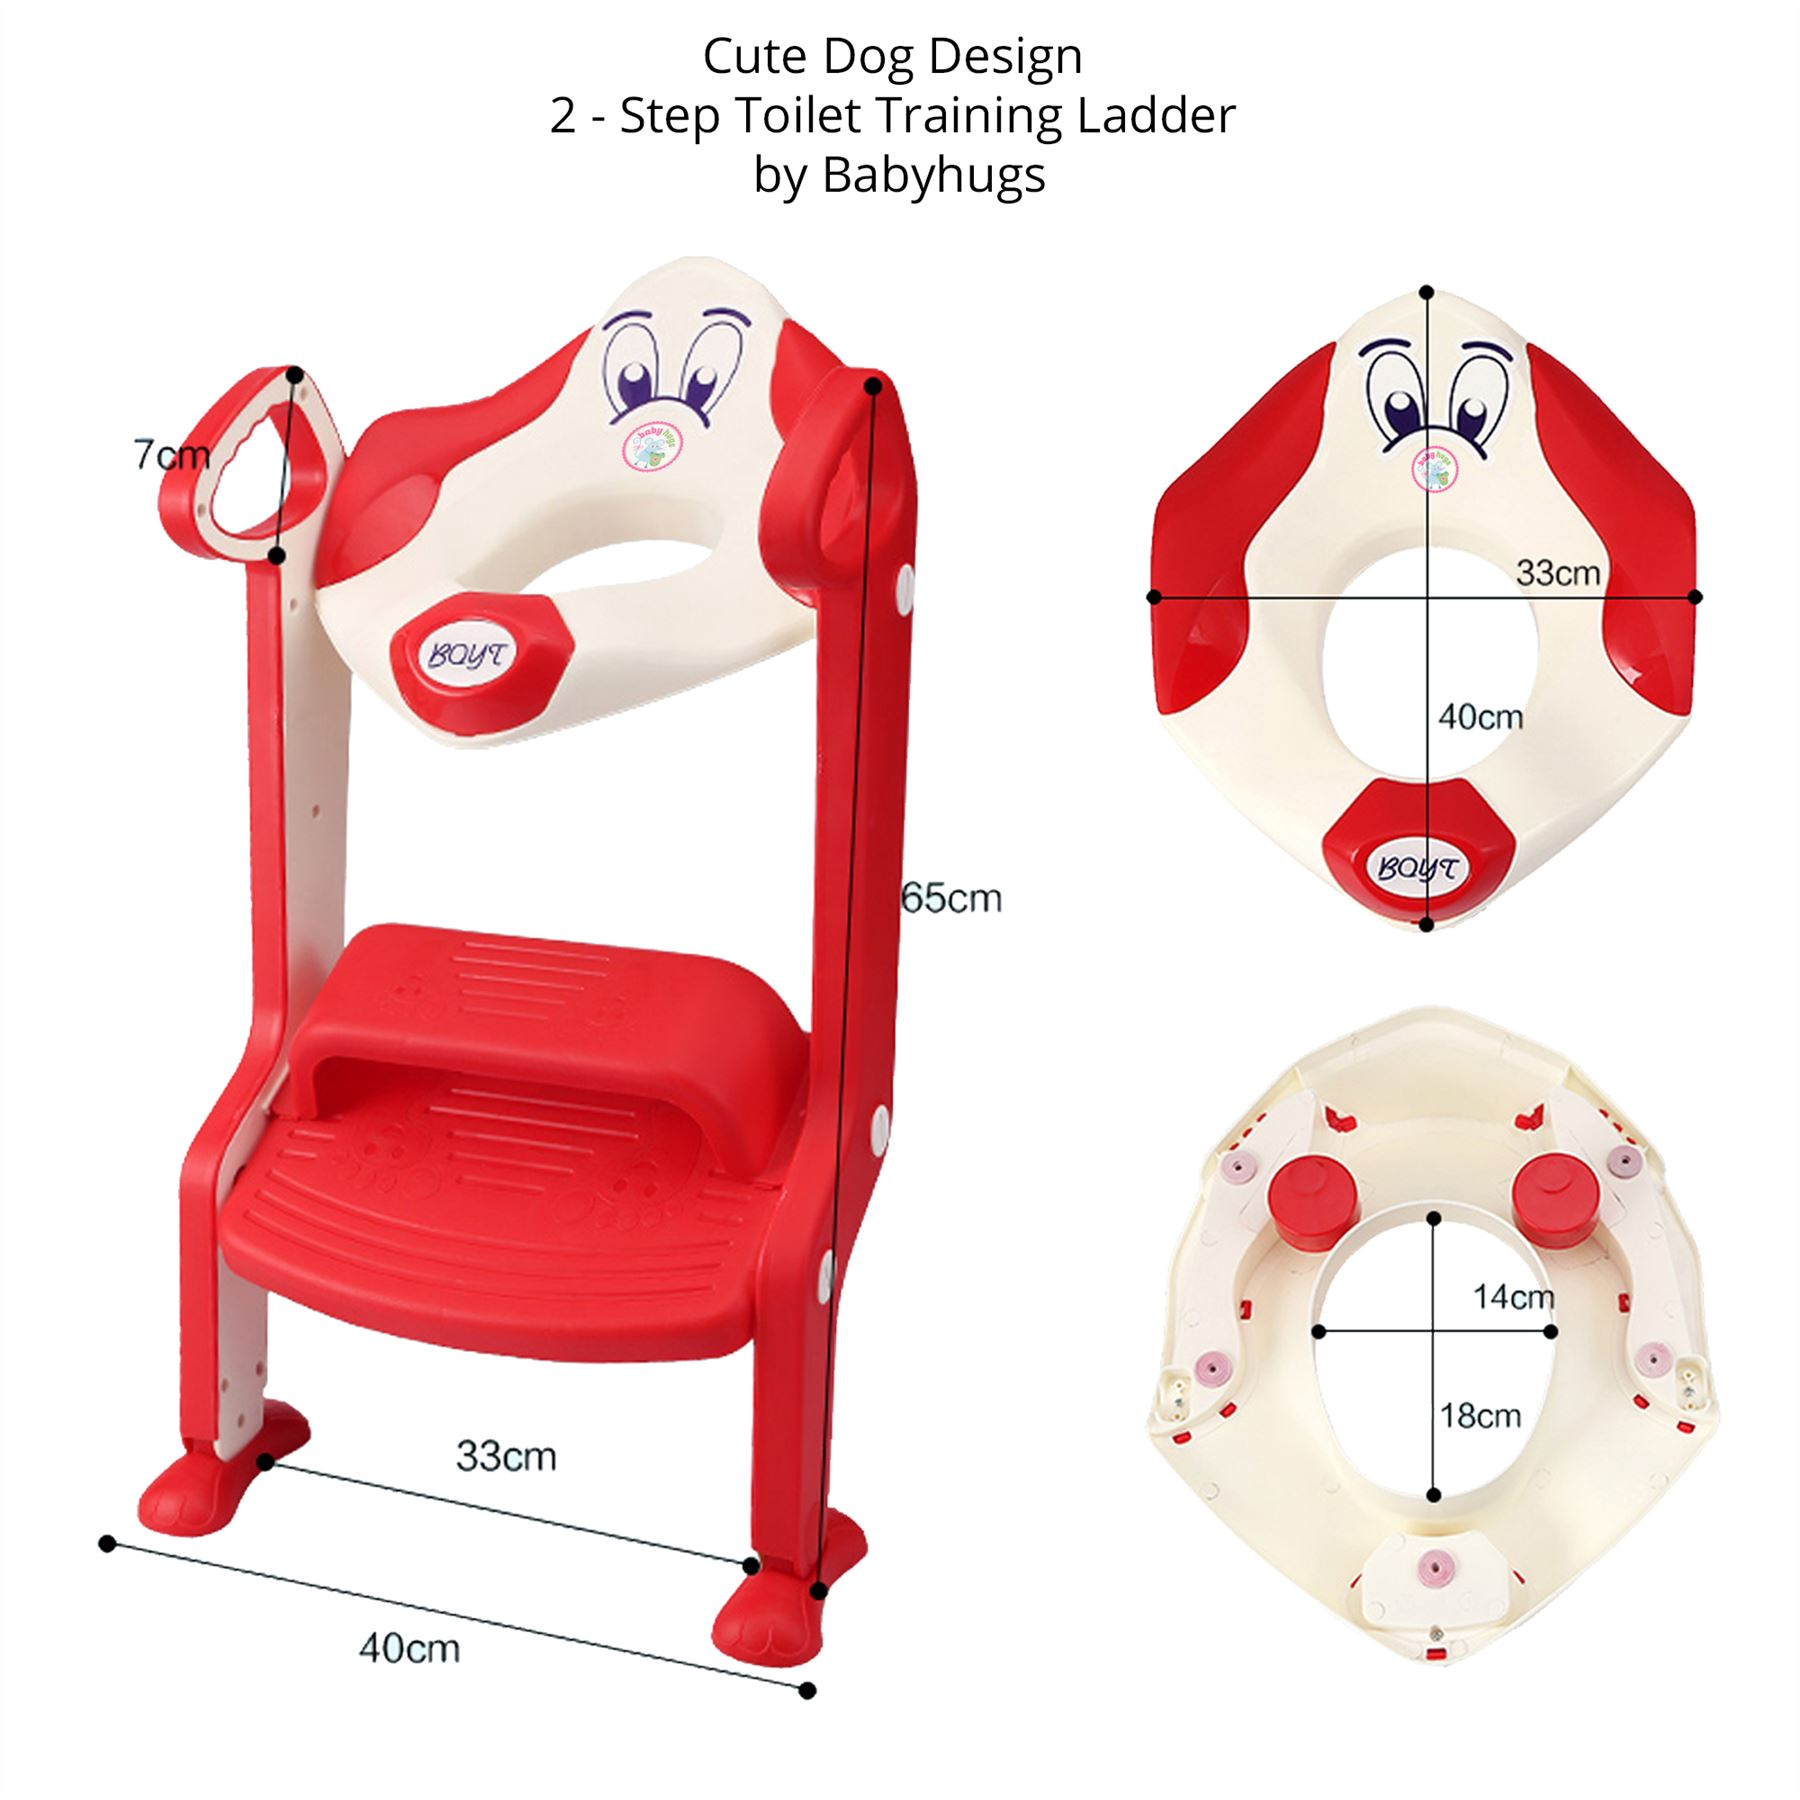 baby toddler toilet training potty seat 2 step ladder toilet trainer for child ebay. Black Bedroom Furniture Sets. Home Design Ideas